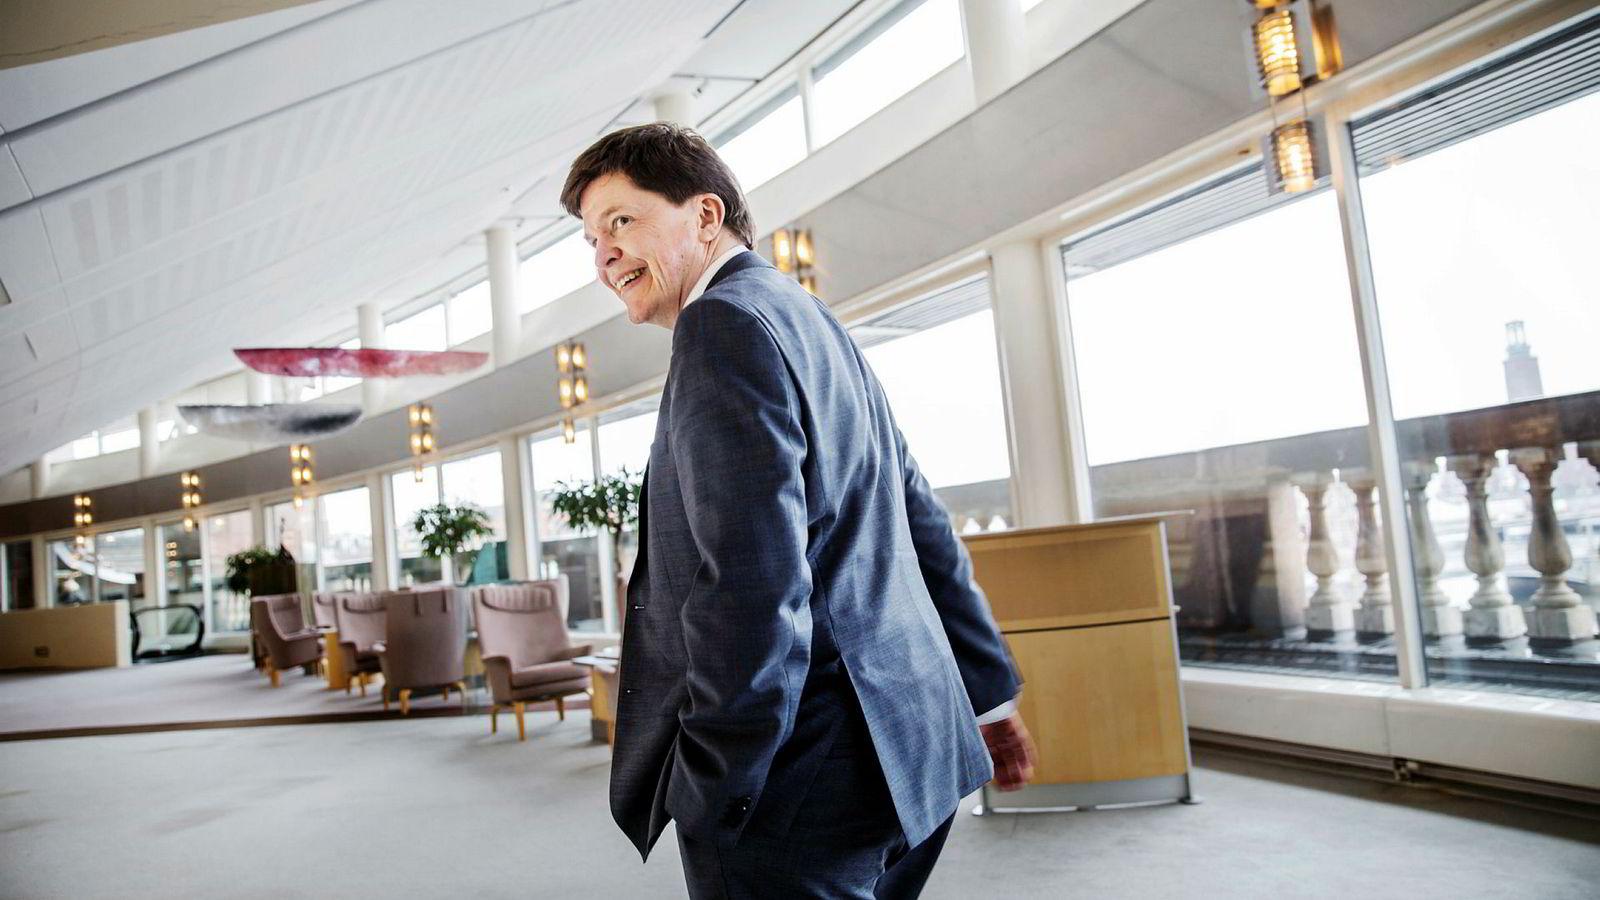 Sveriges talman Andreas Norlén i gangene utenfor kammeren i Sveriges Riksdag.